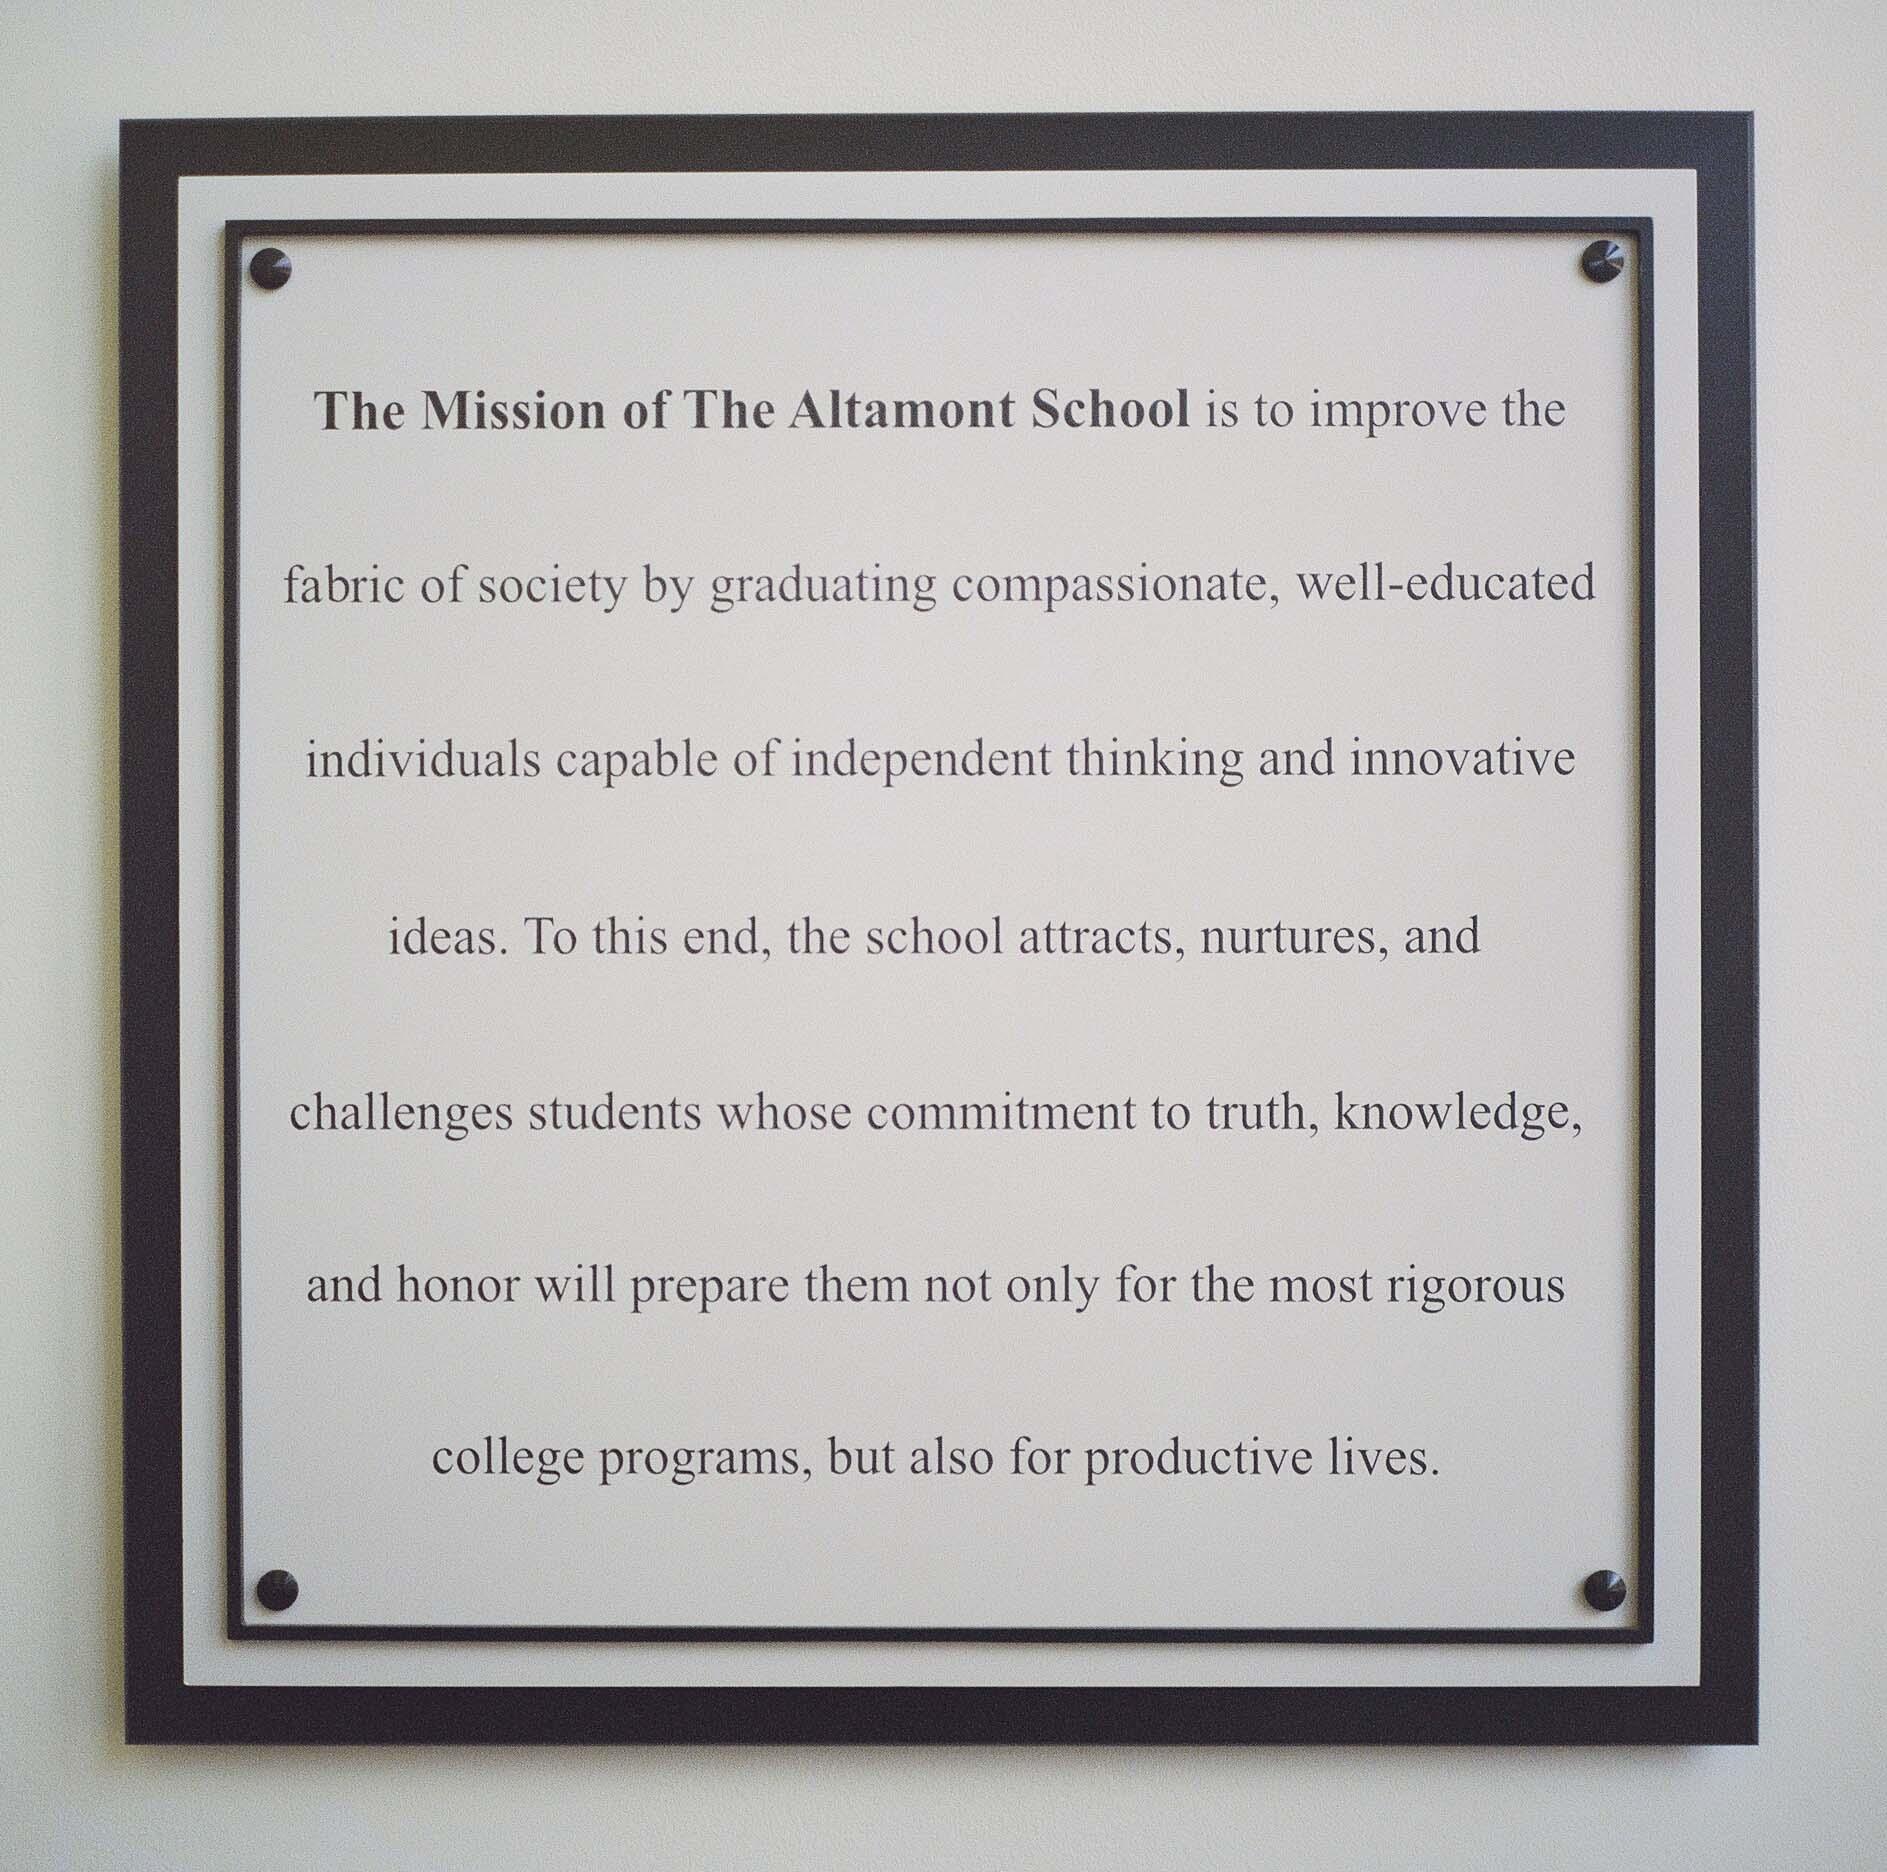 Mission Values The Altamont School